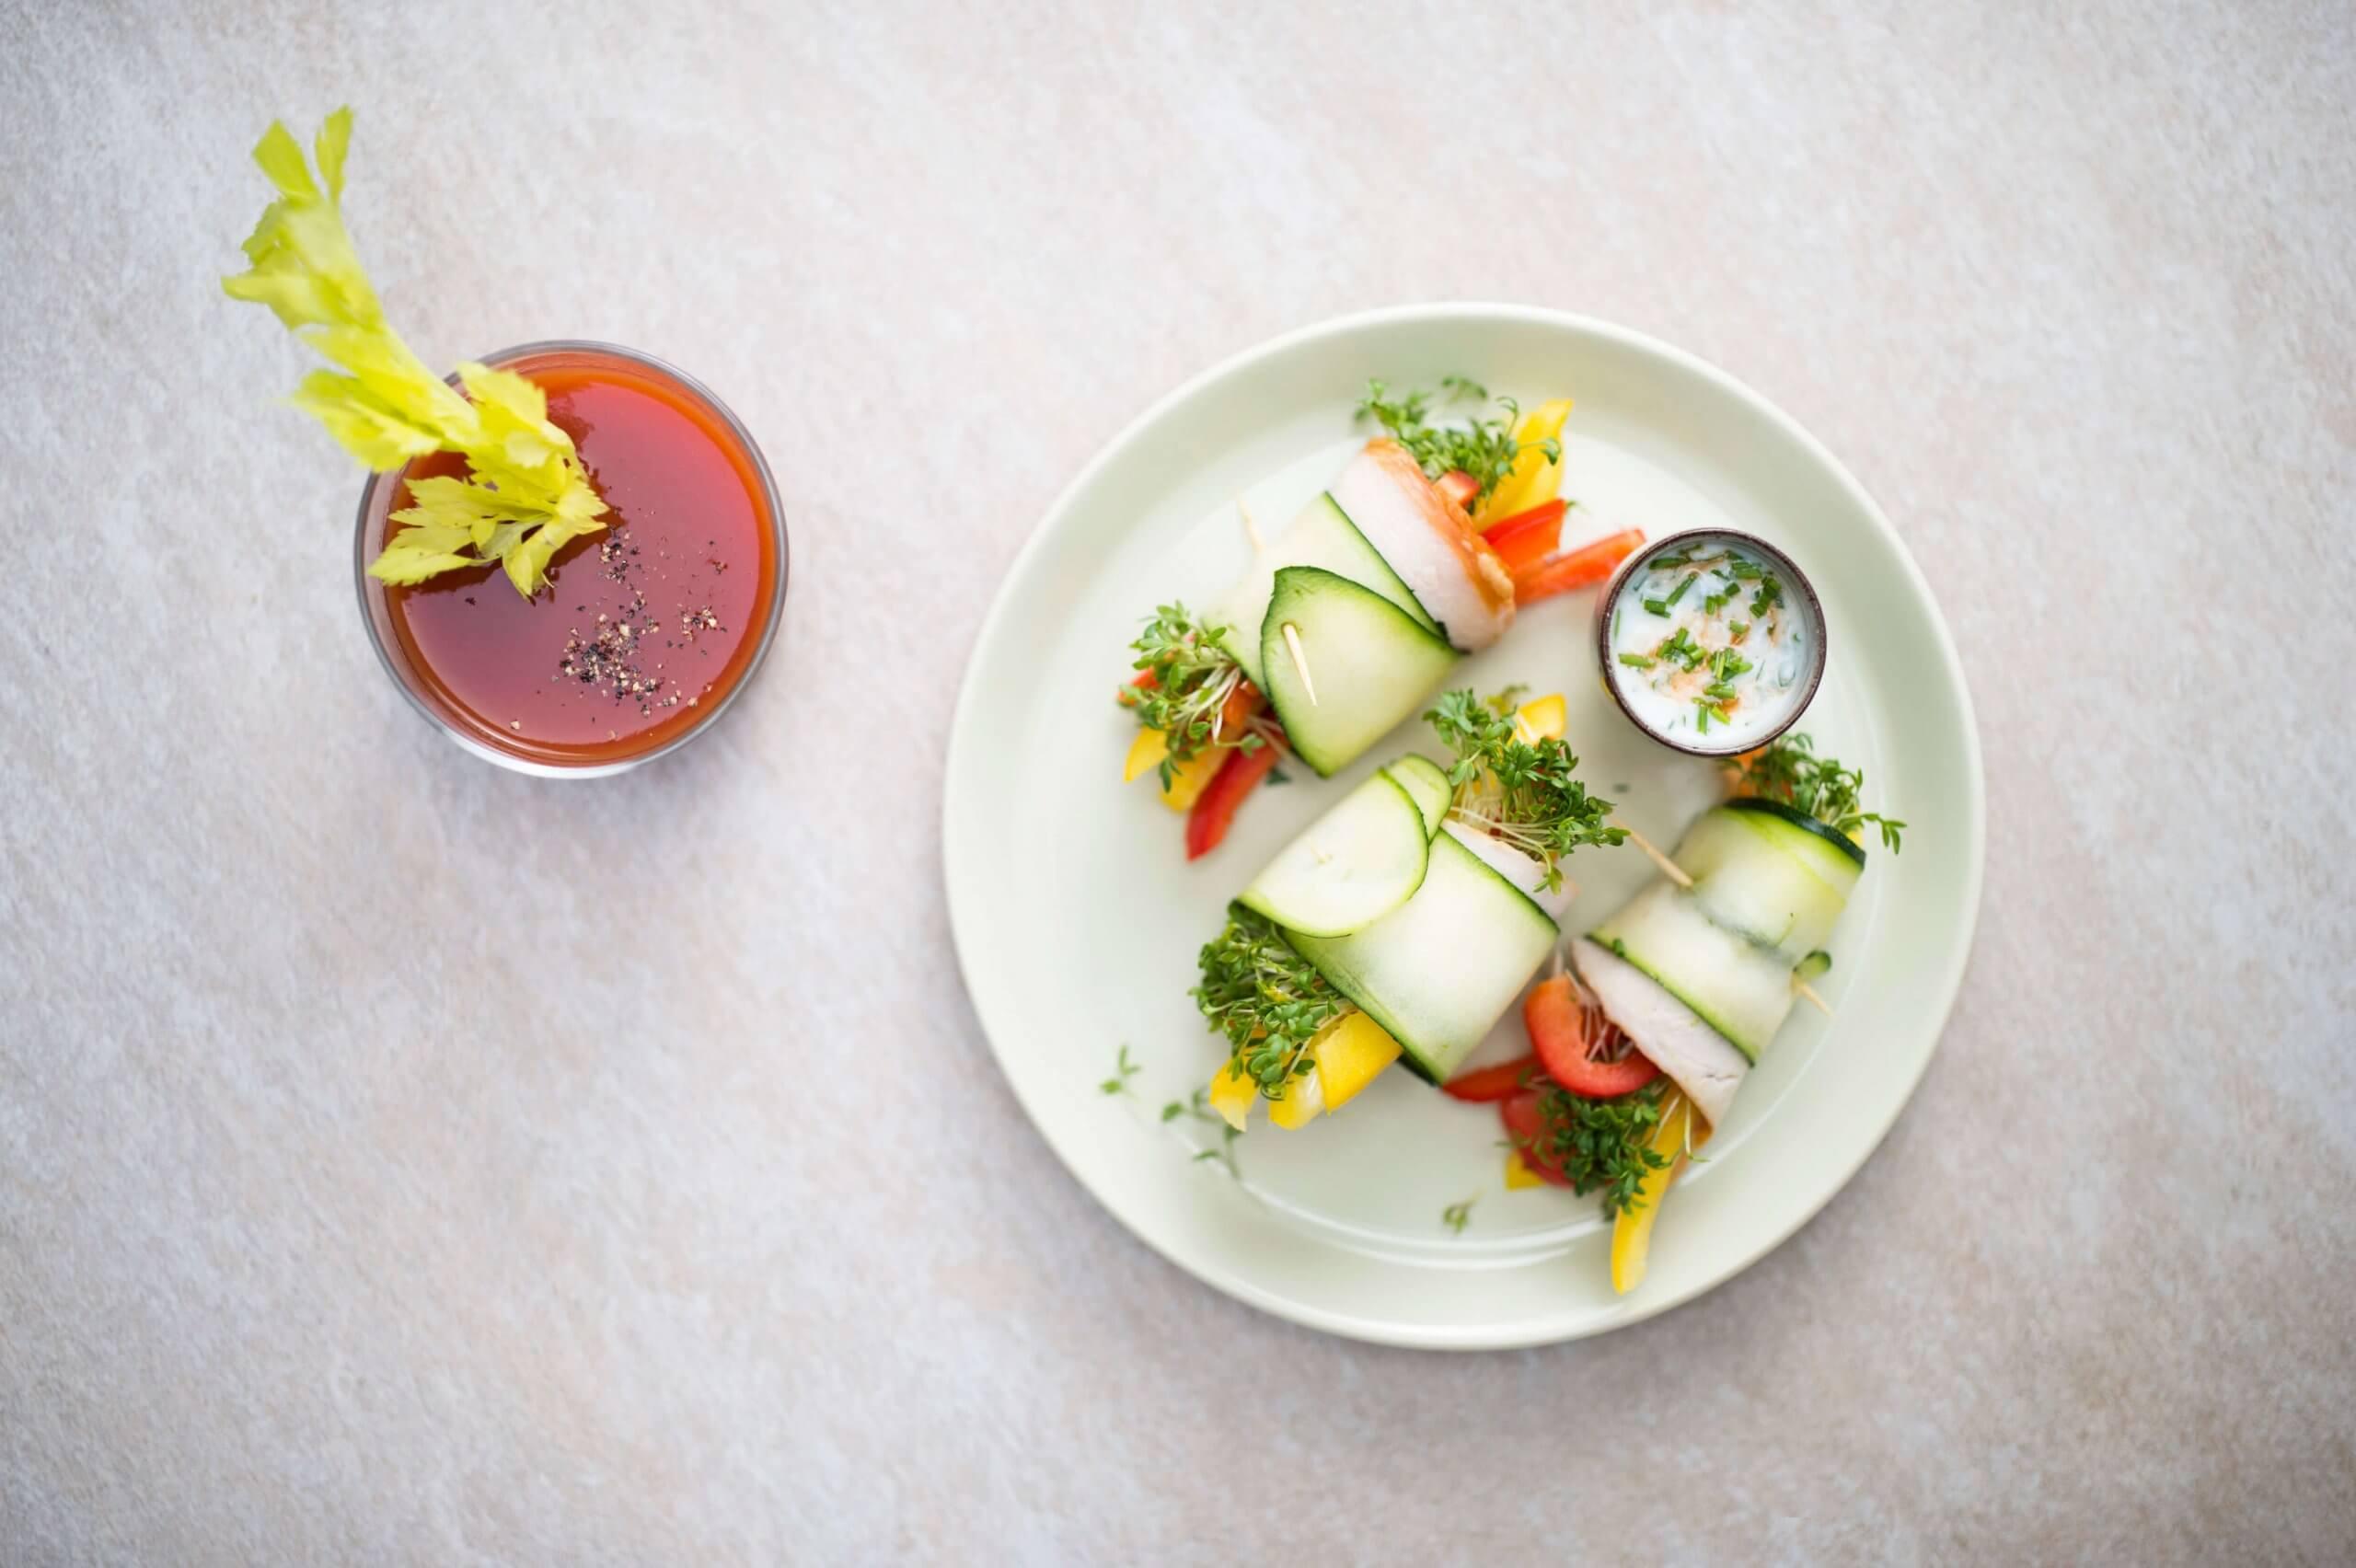 Courgetterolletjes van gerookte kip en paprika met een knoflook/yoghurtdressing